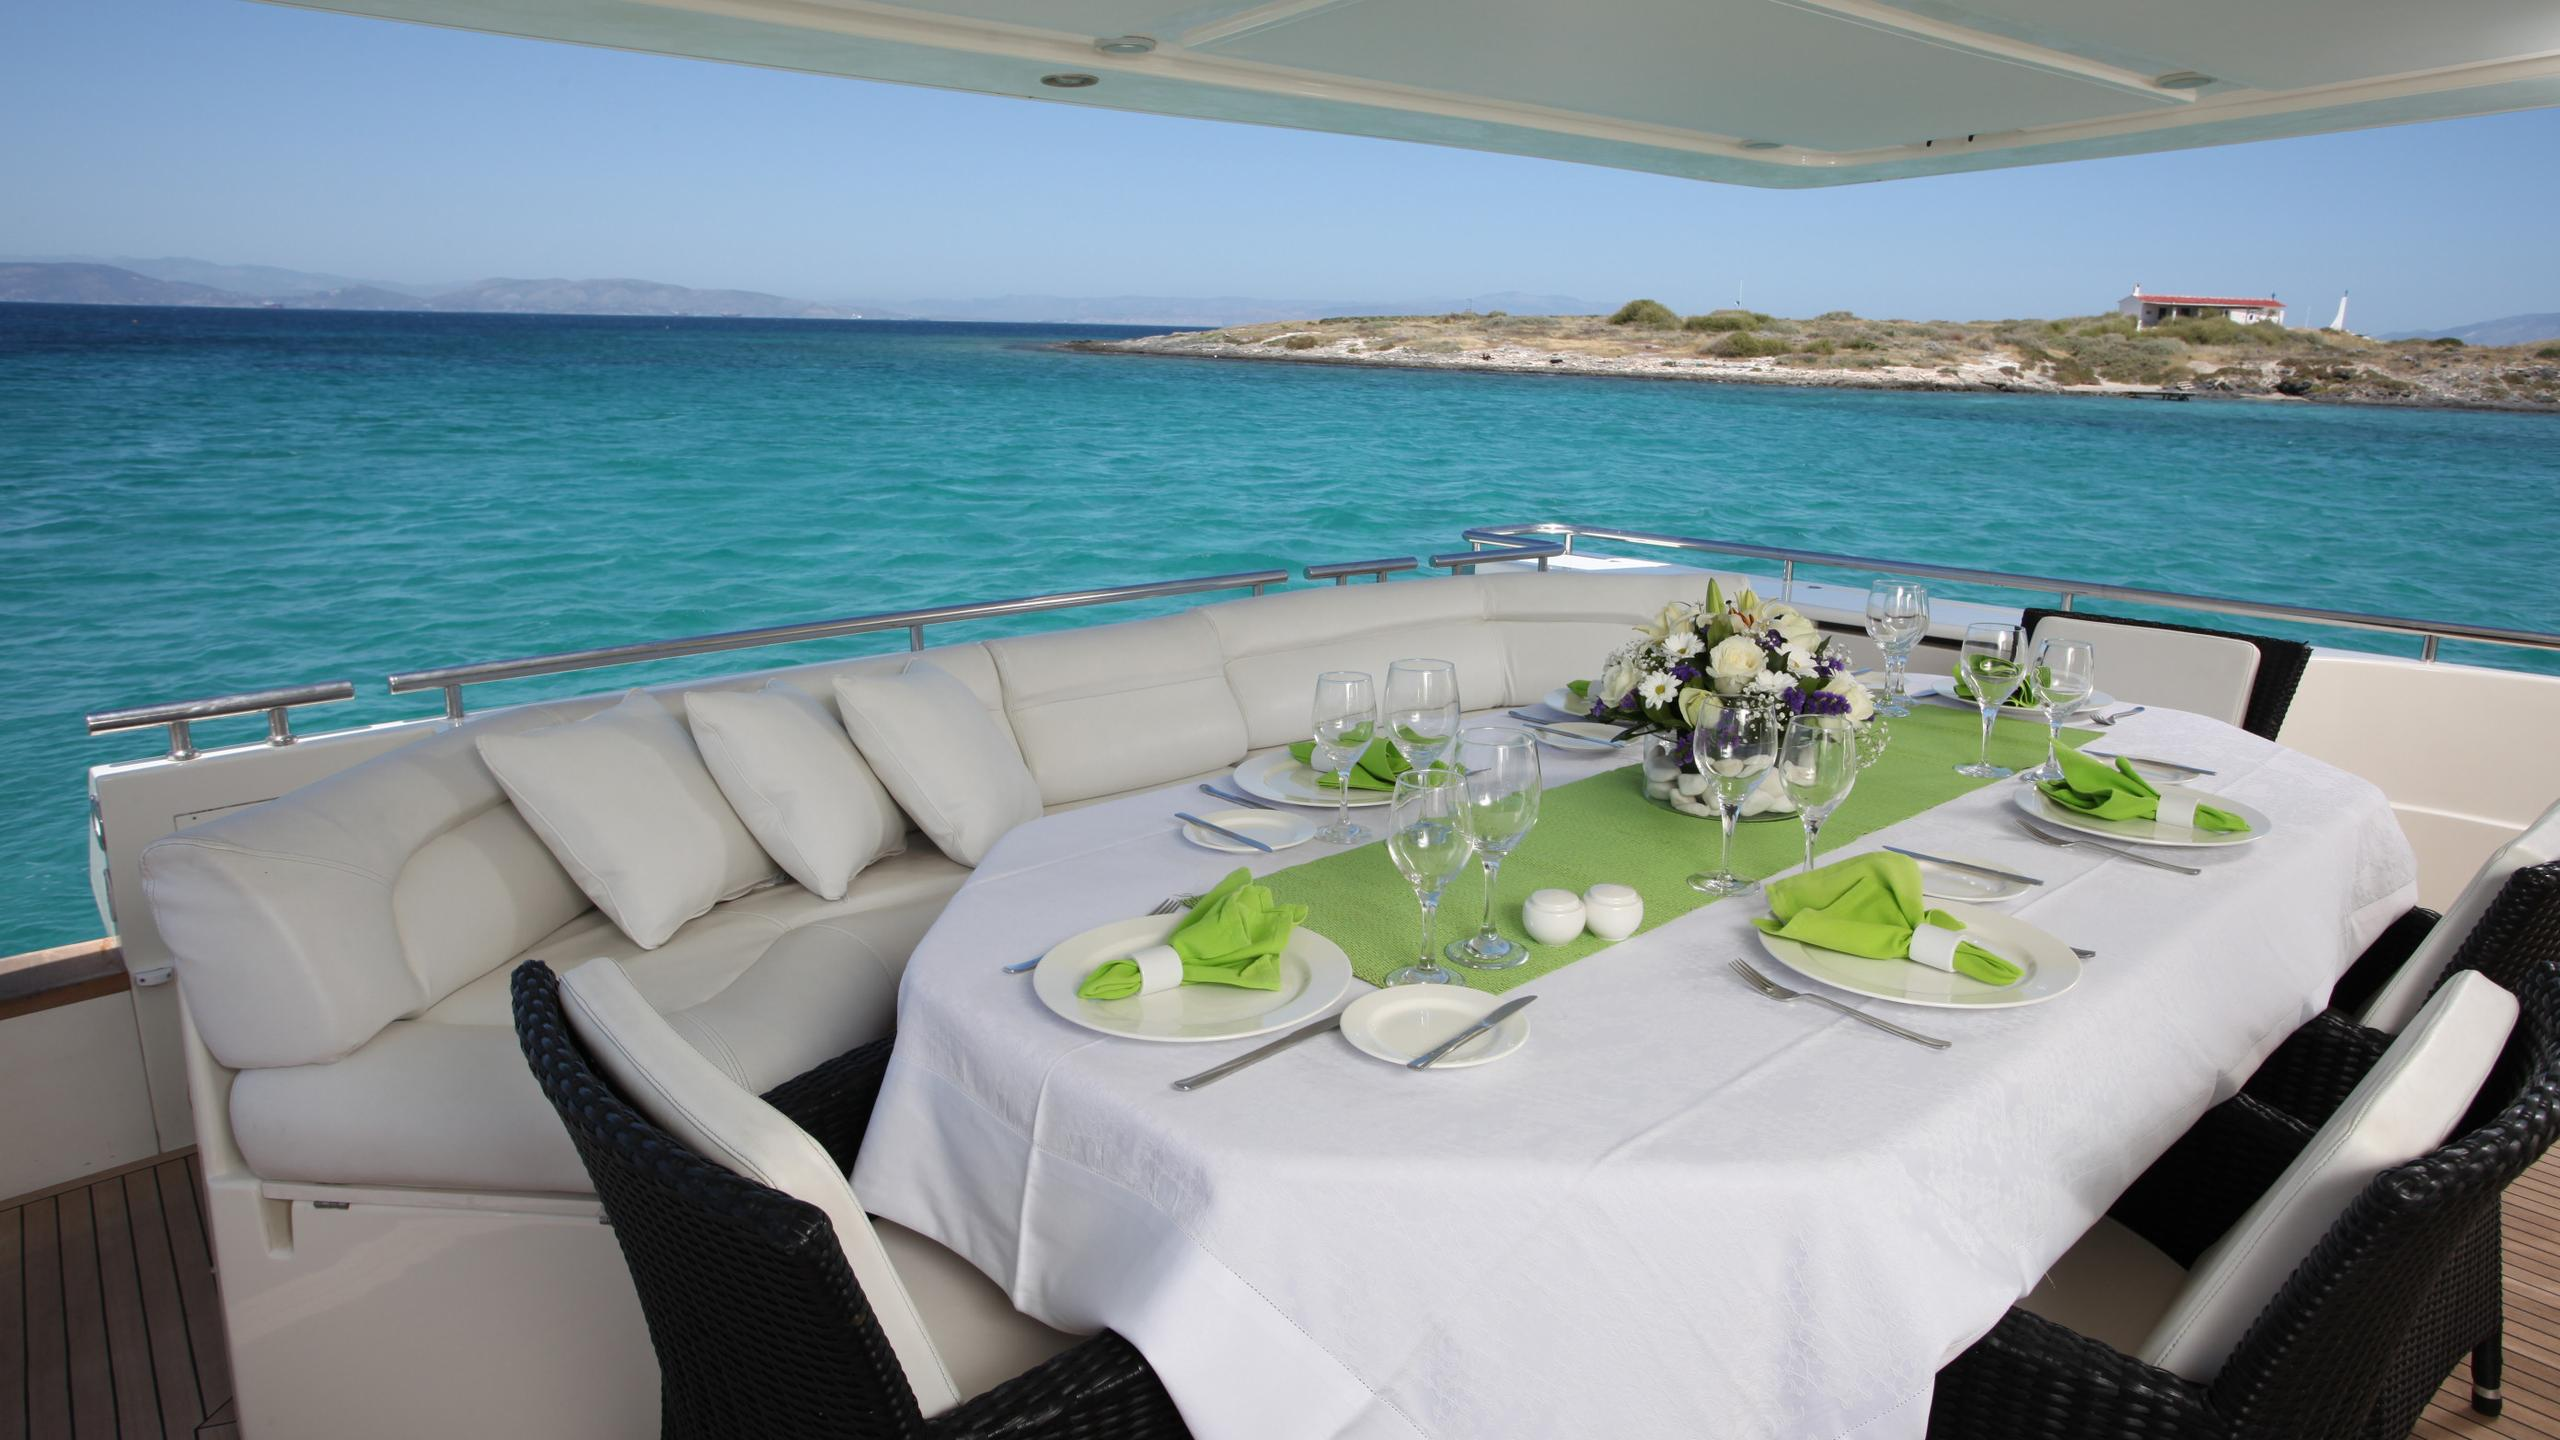 kentavros-ii-yacht-aft-dining